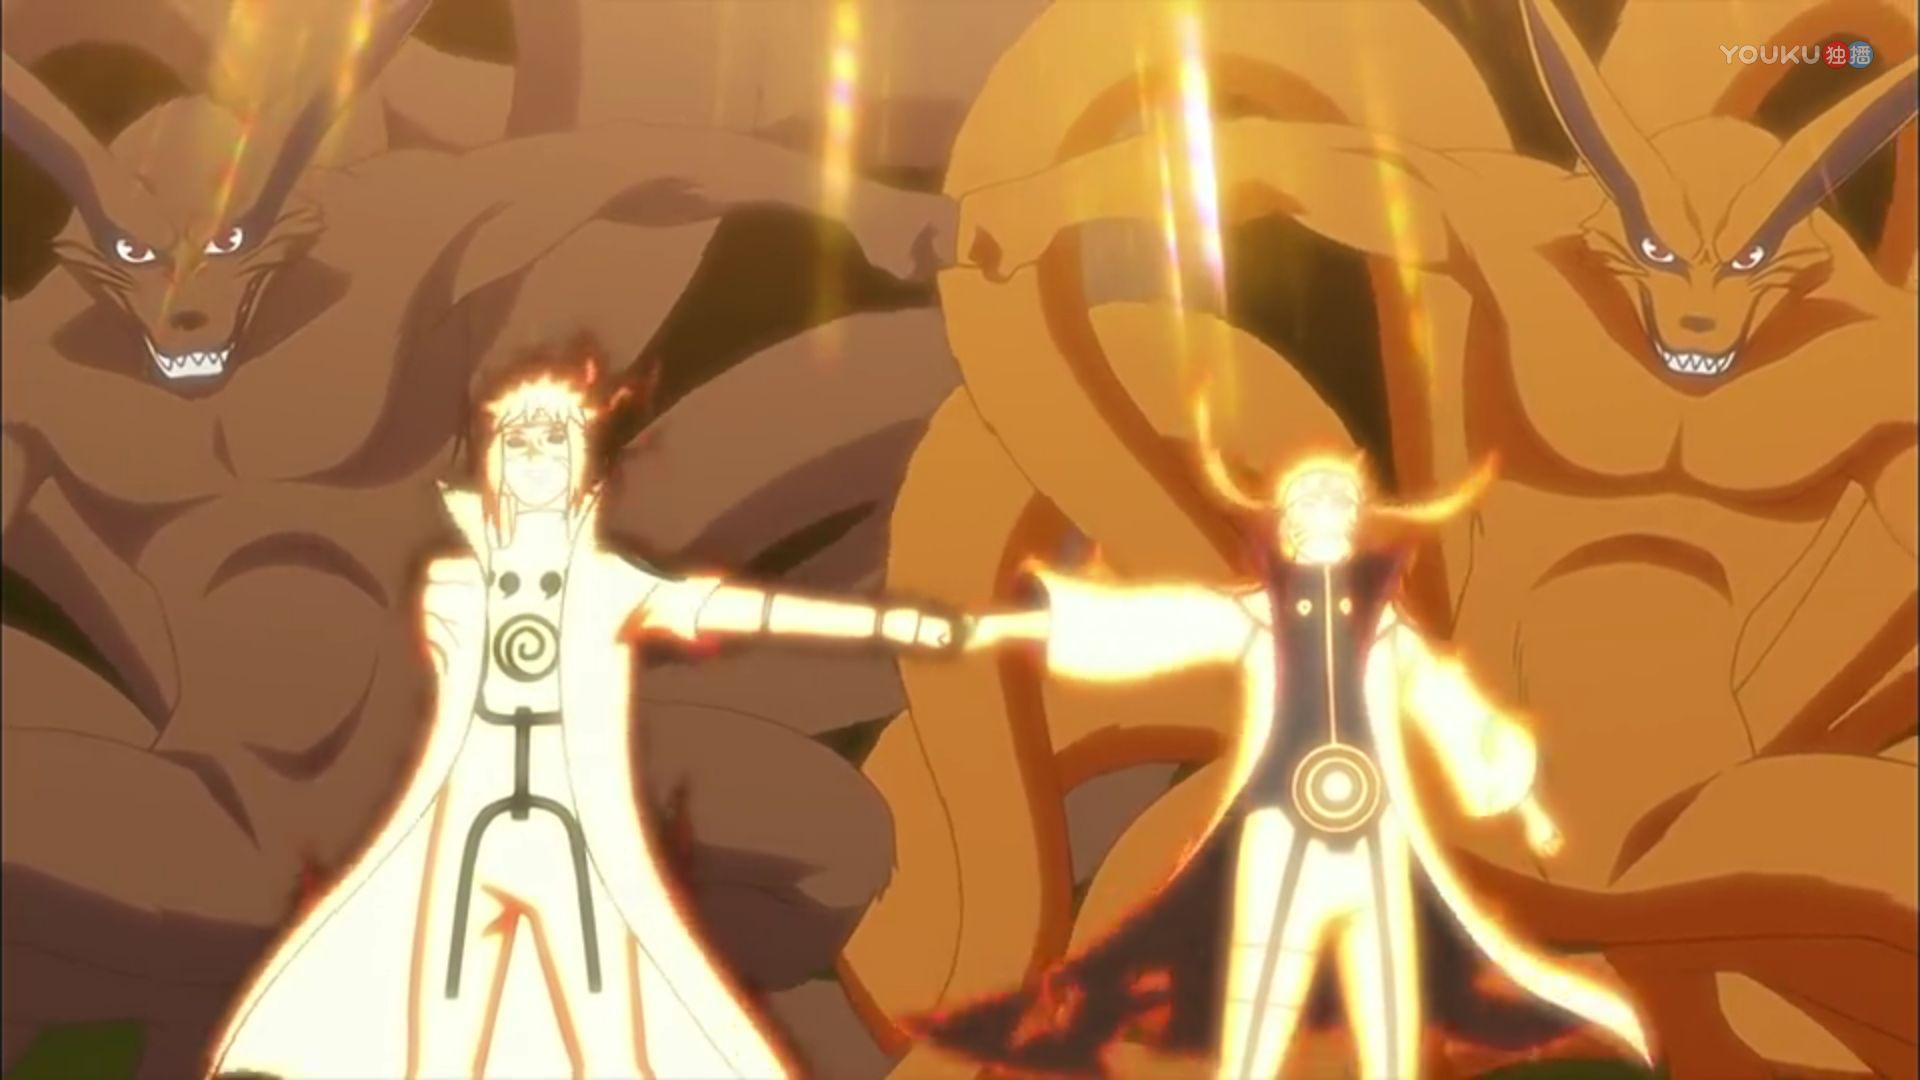 10 Duet Shinobi Terkuat di Anime Naruto 8